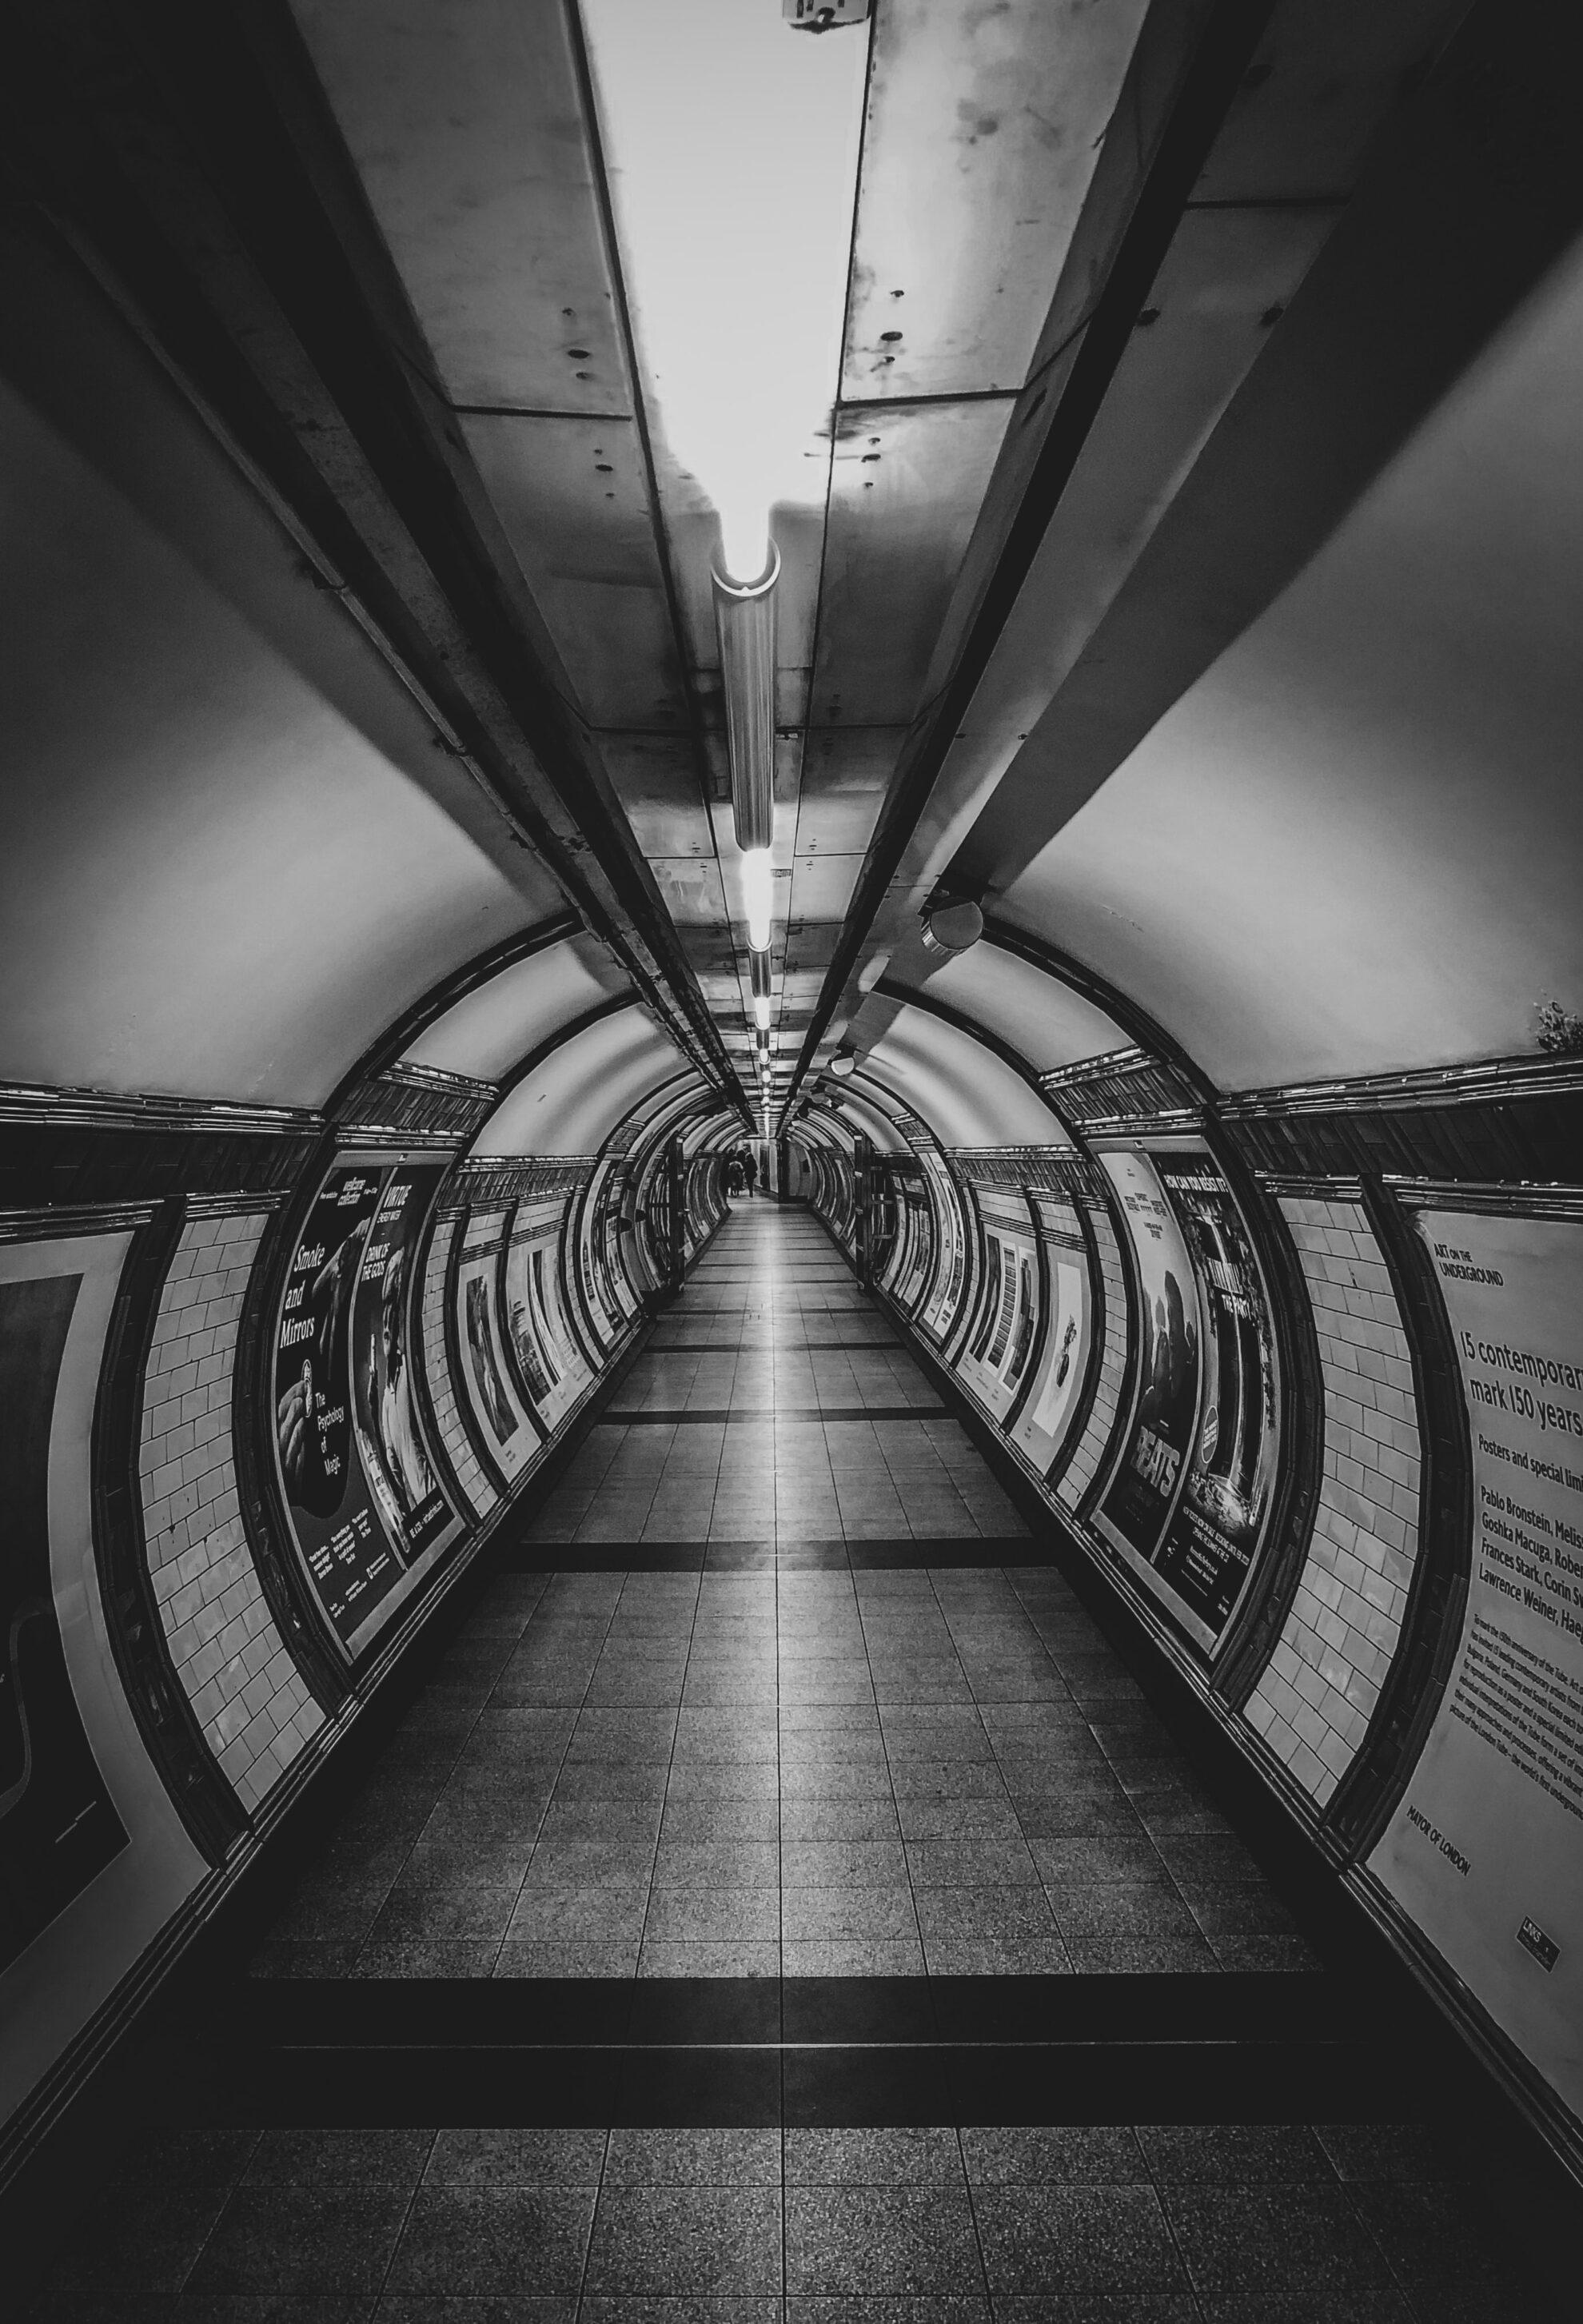 Charing Cross Station, London